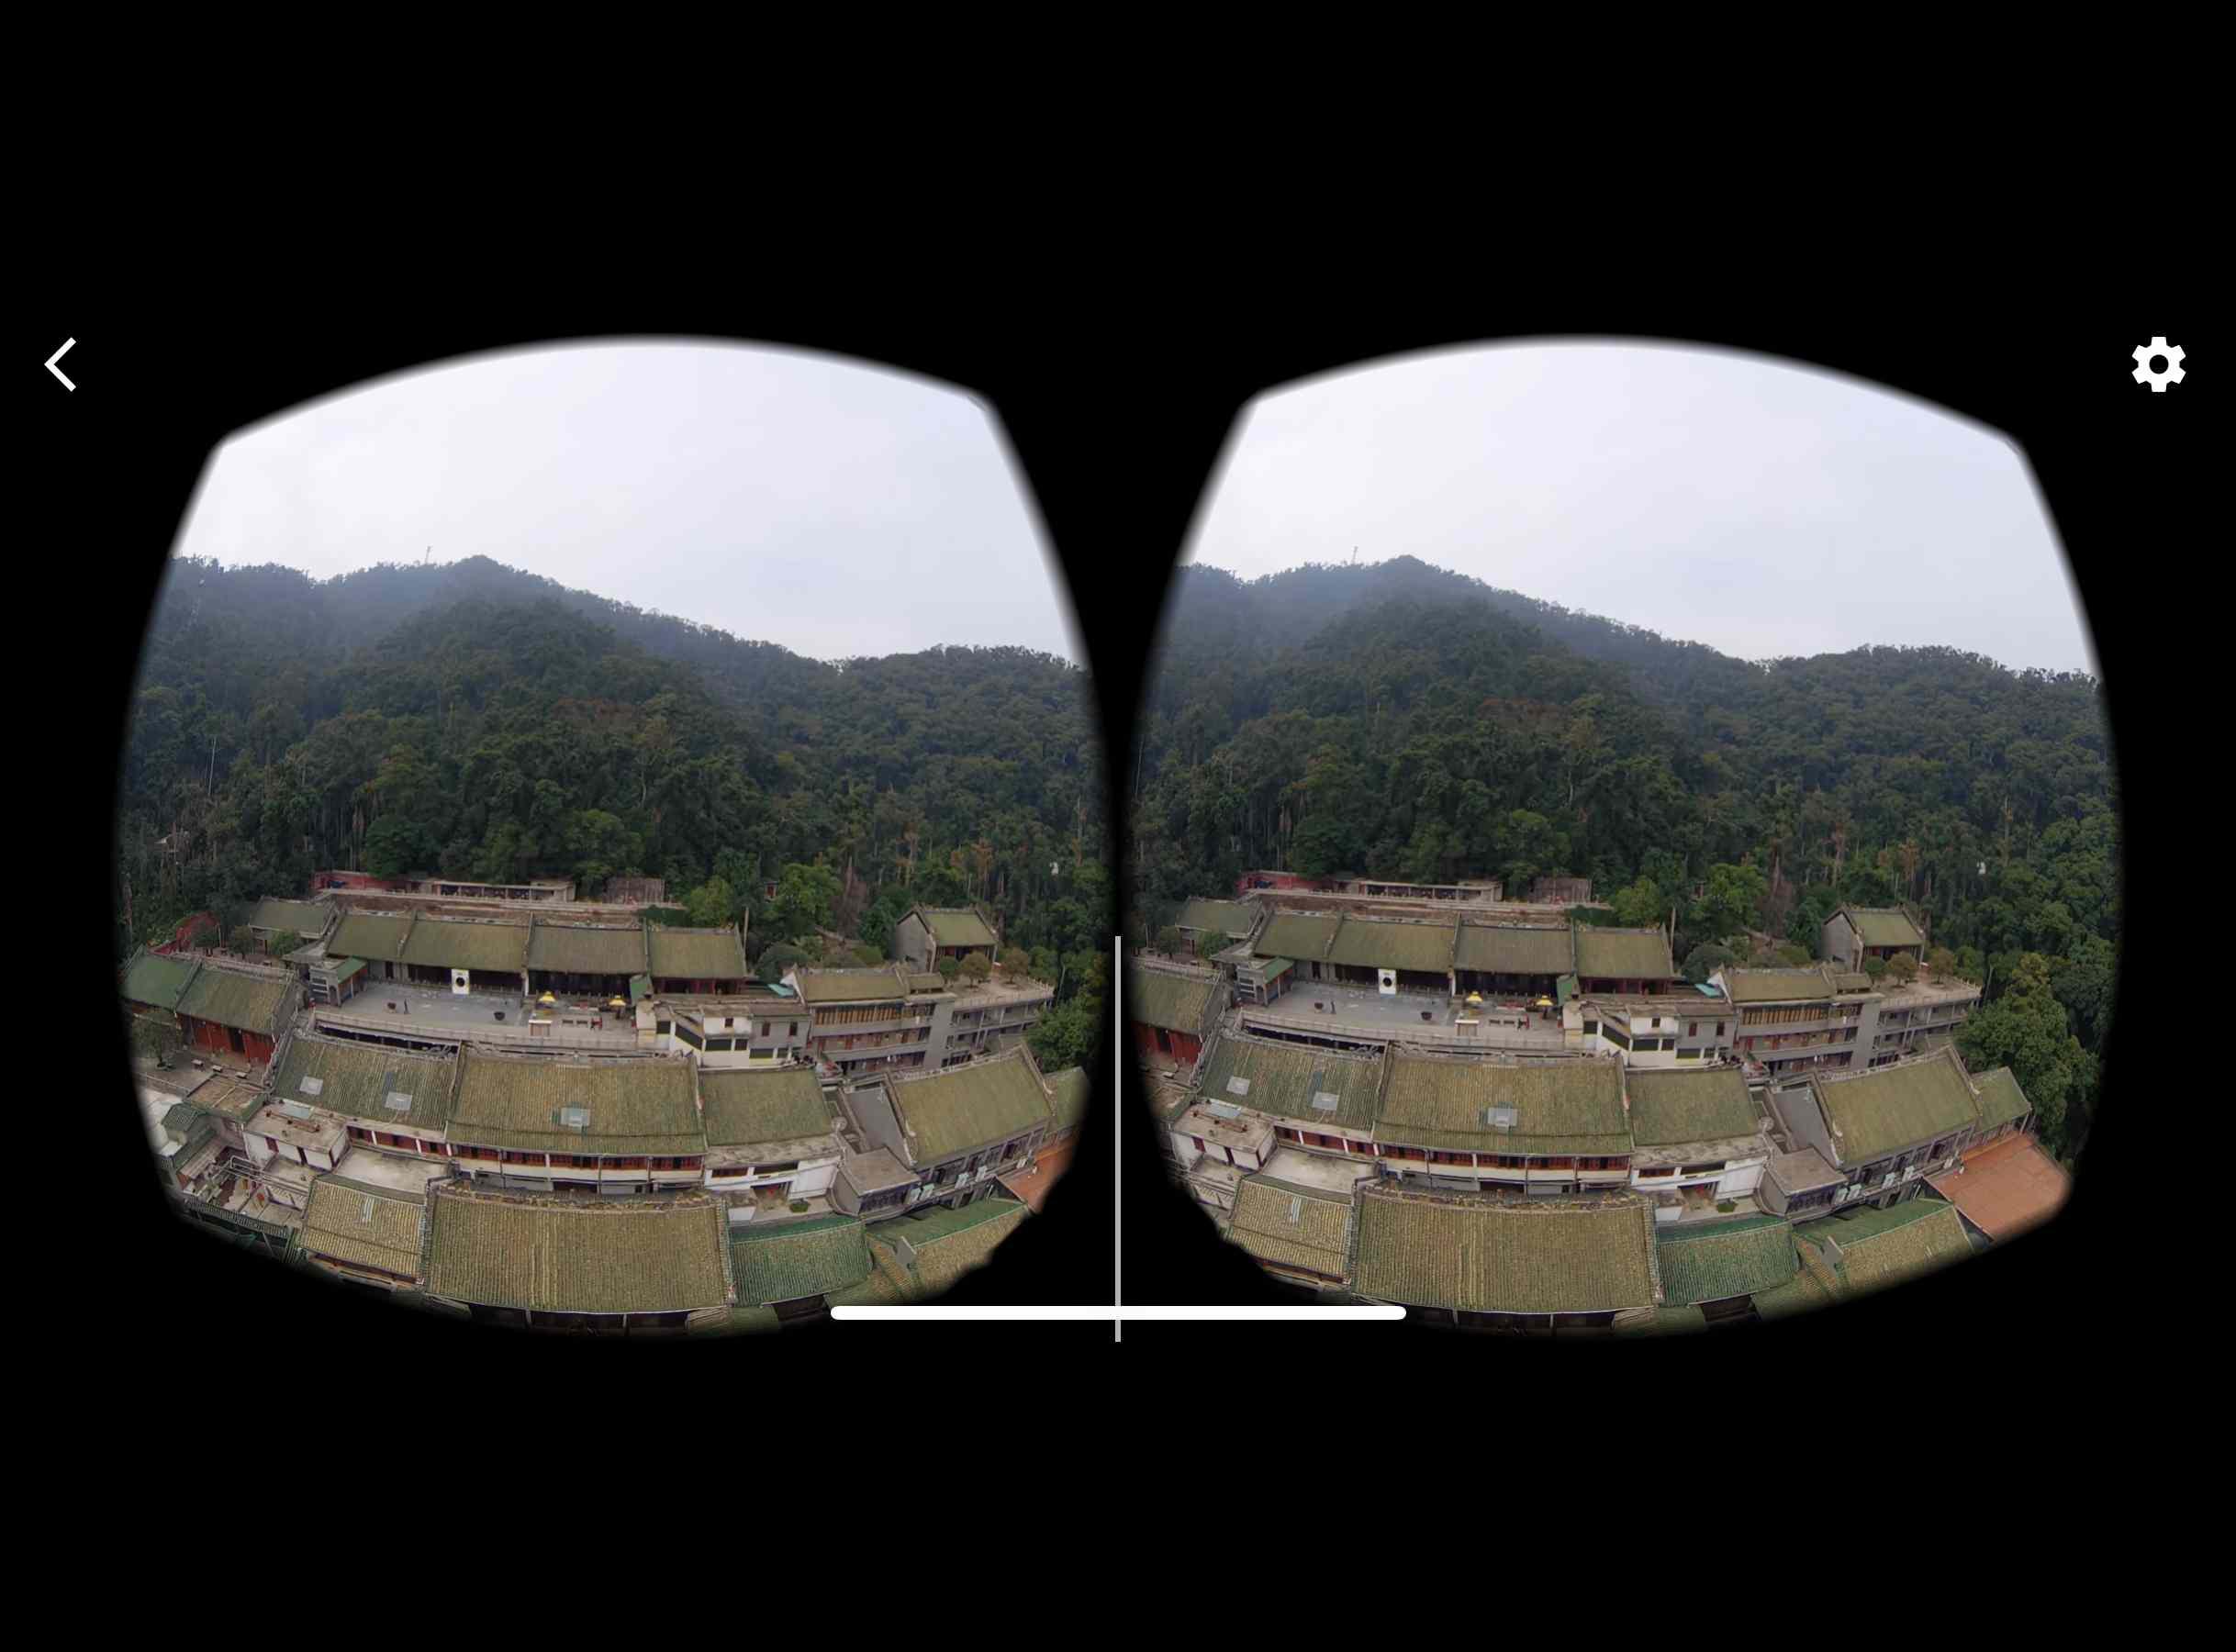 360 VR video in Google Cardboard mode in the iPhone YouTube app